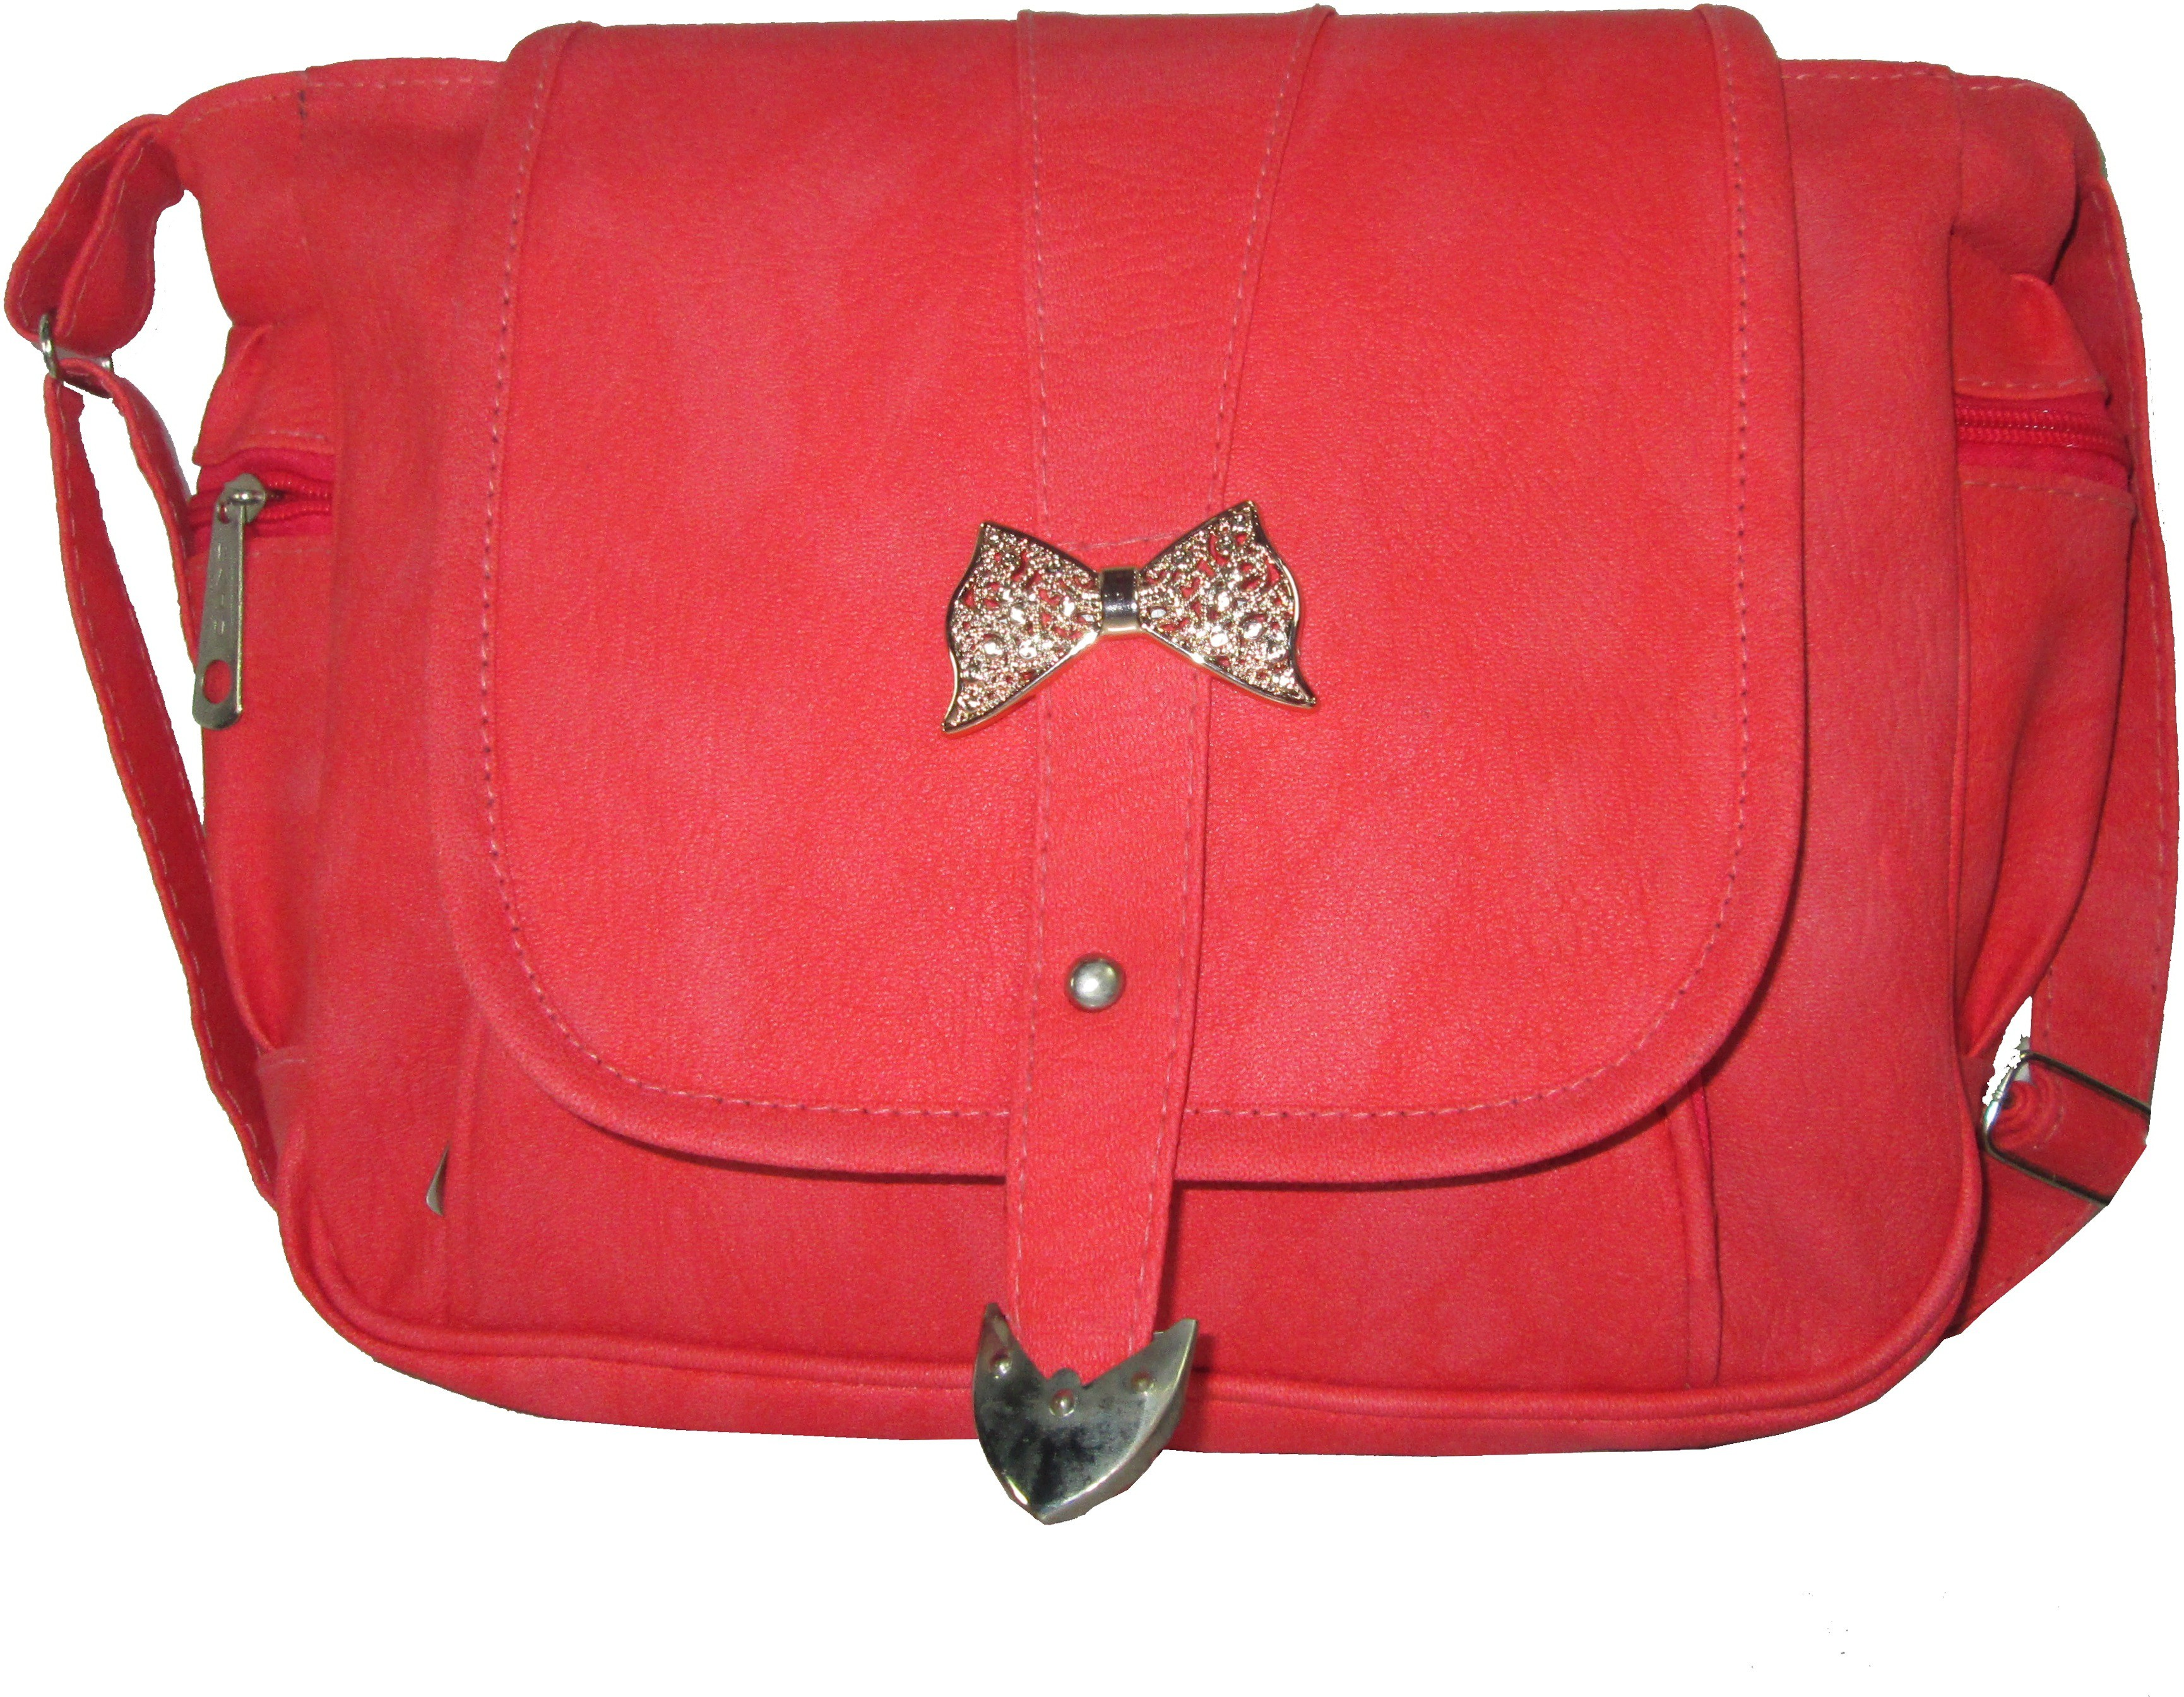 Sling bag below 500 - Raju Purse Collection Women Pink Pu Sling Bag